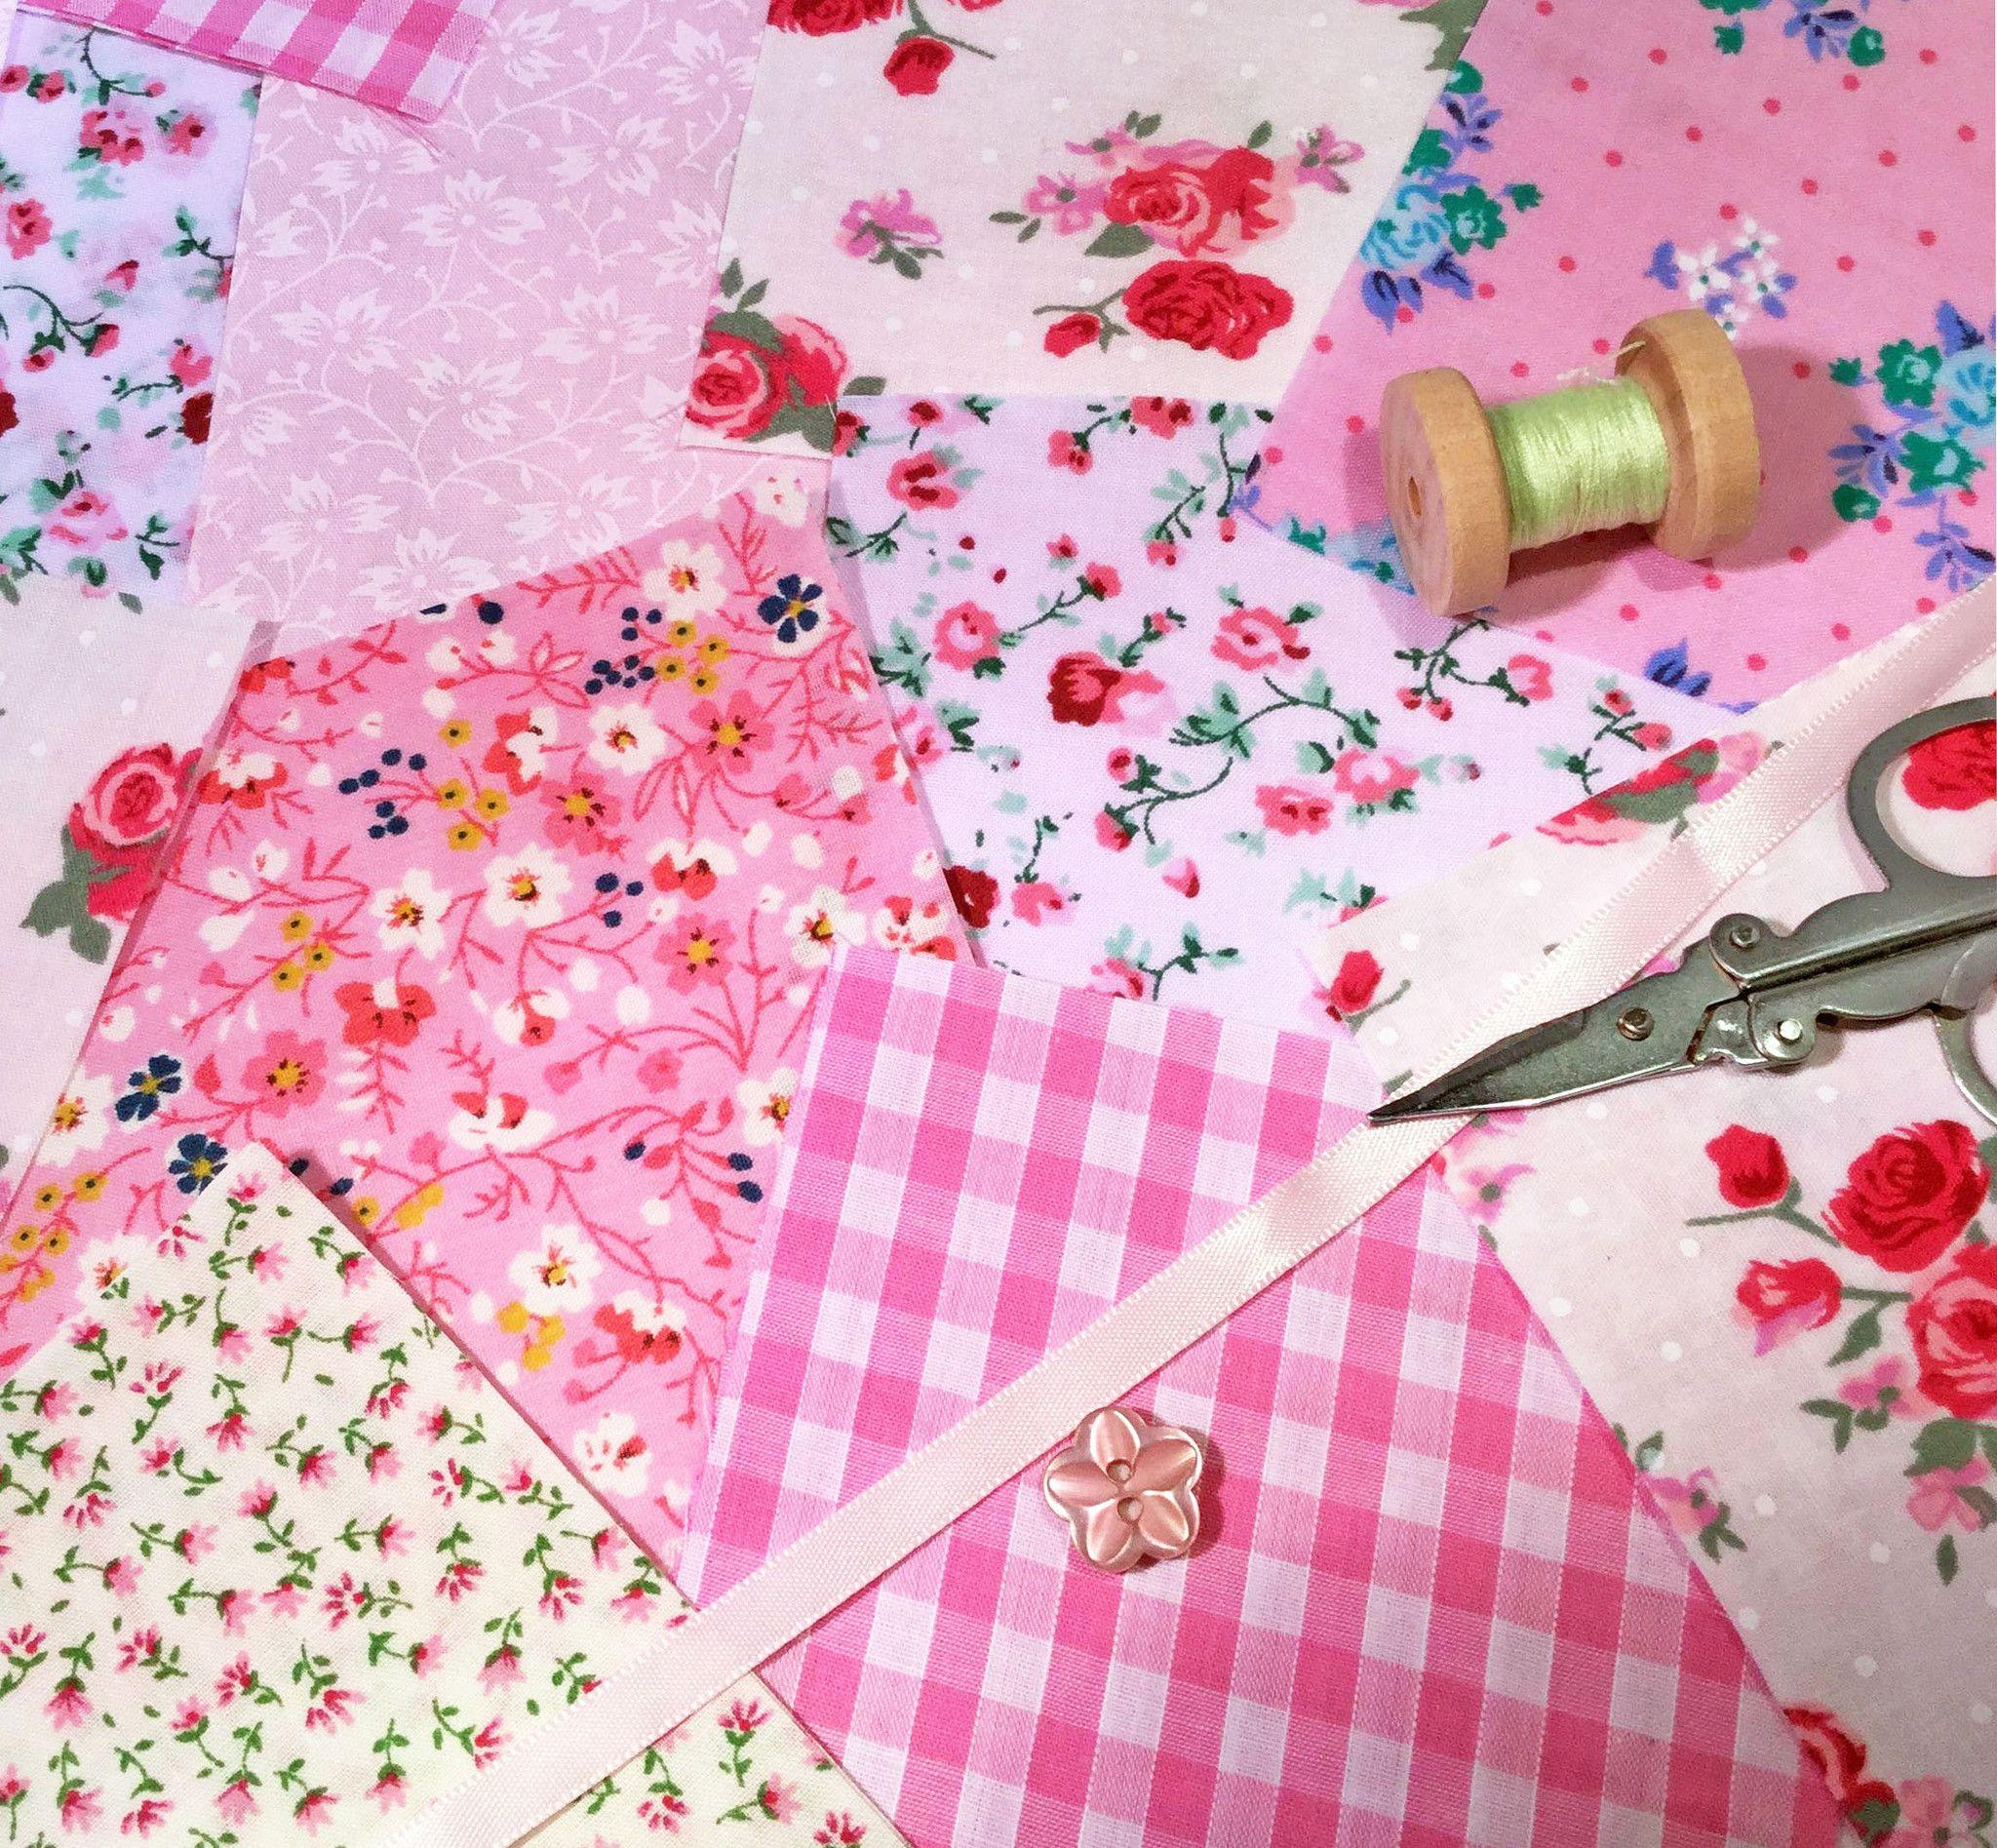 x 50 Pre Cut 10x10cm Patchwork Squares in Pretty Pink